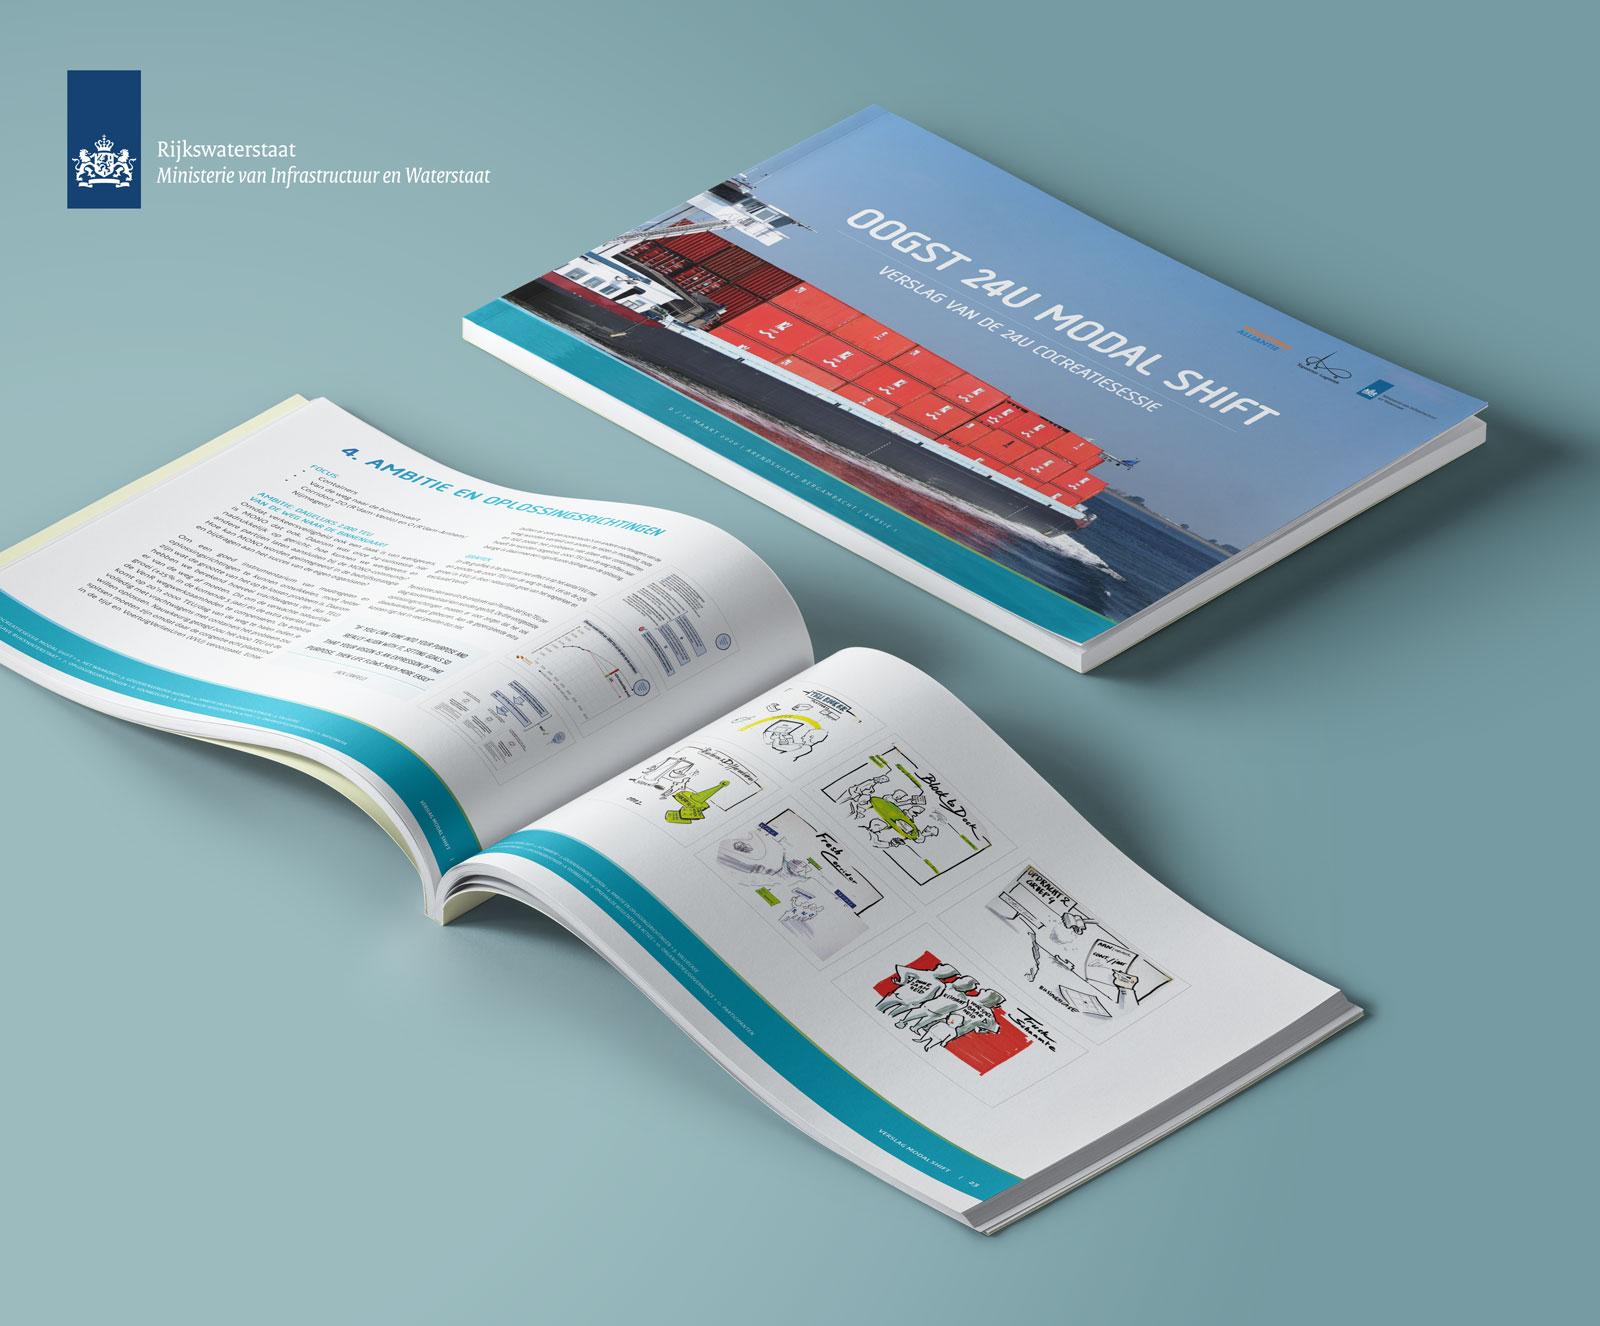 Beeldmarq | Ministerie van infrastructuur en waterstaat | Print- en drukwerk